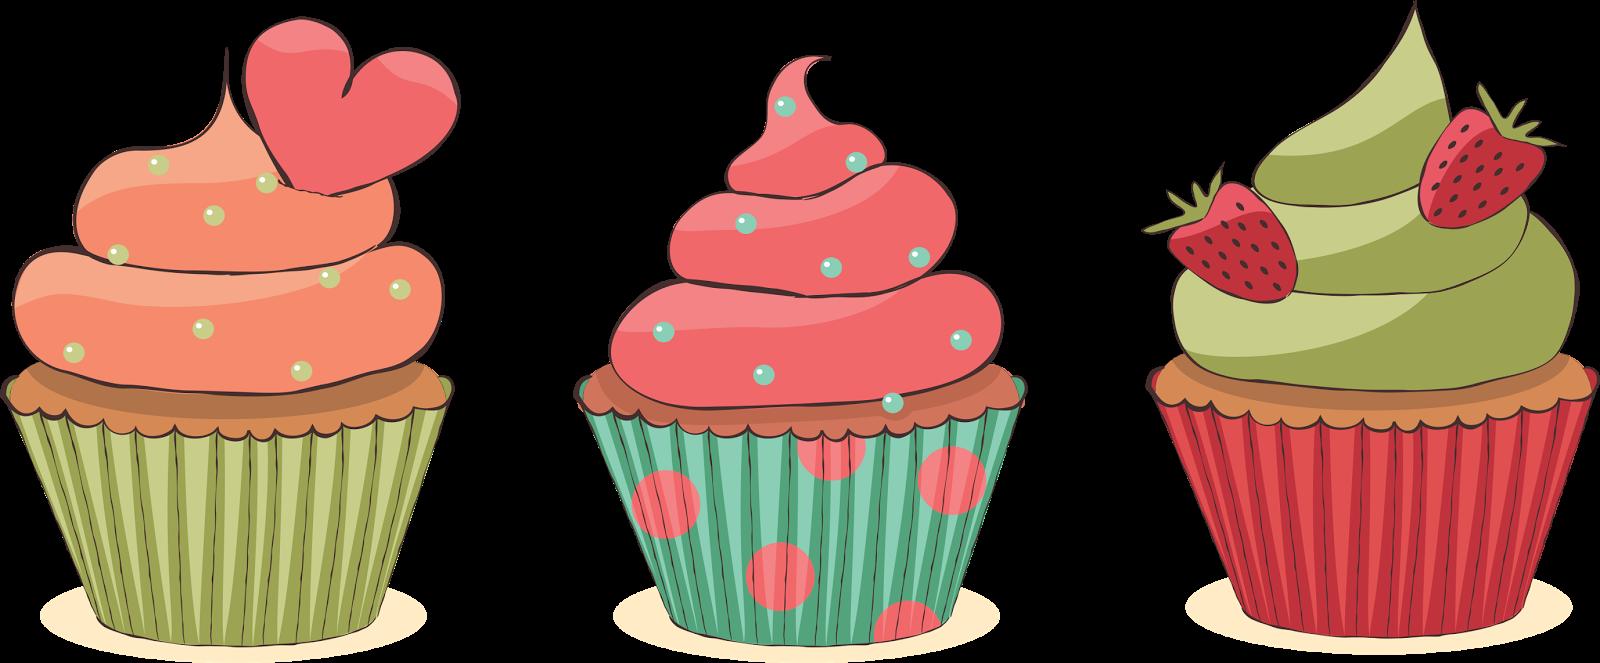 graphic transparent download cupcakes desenho vintage